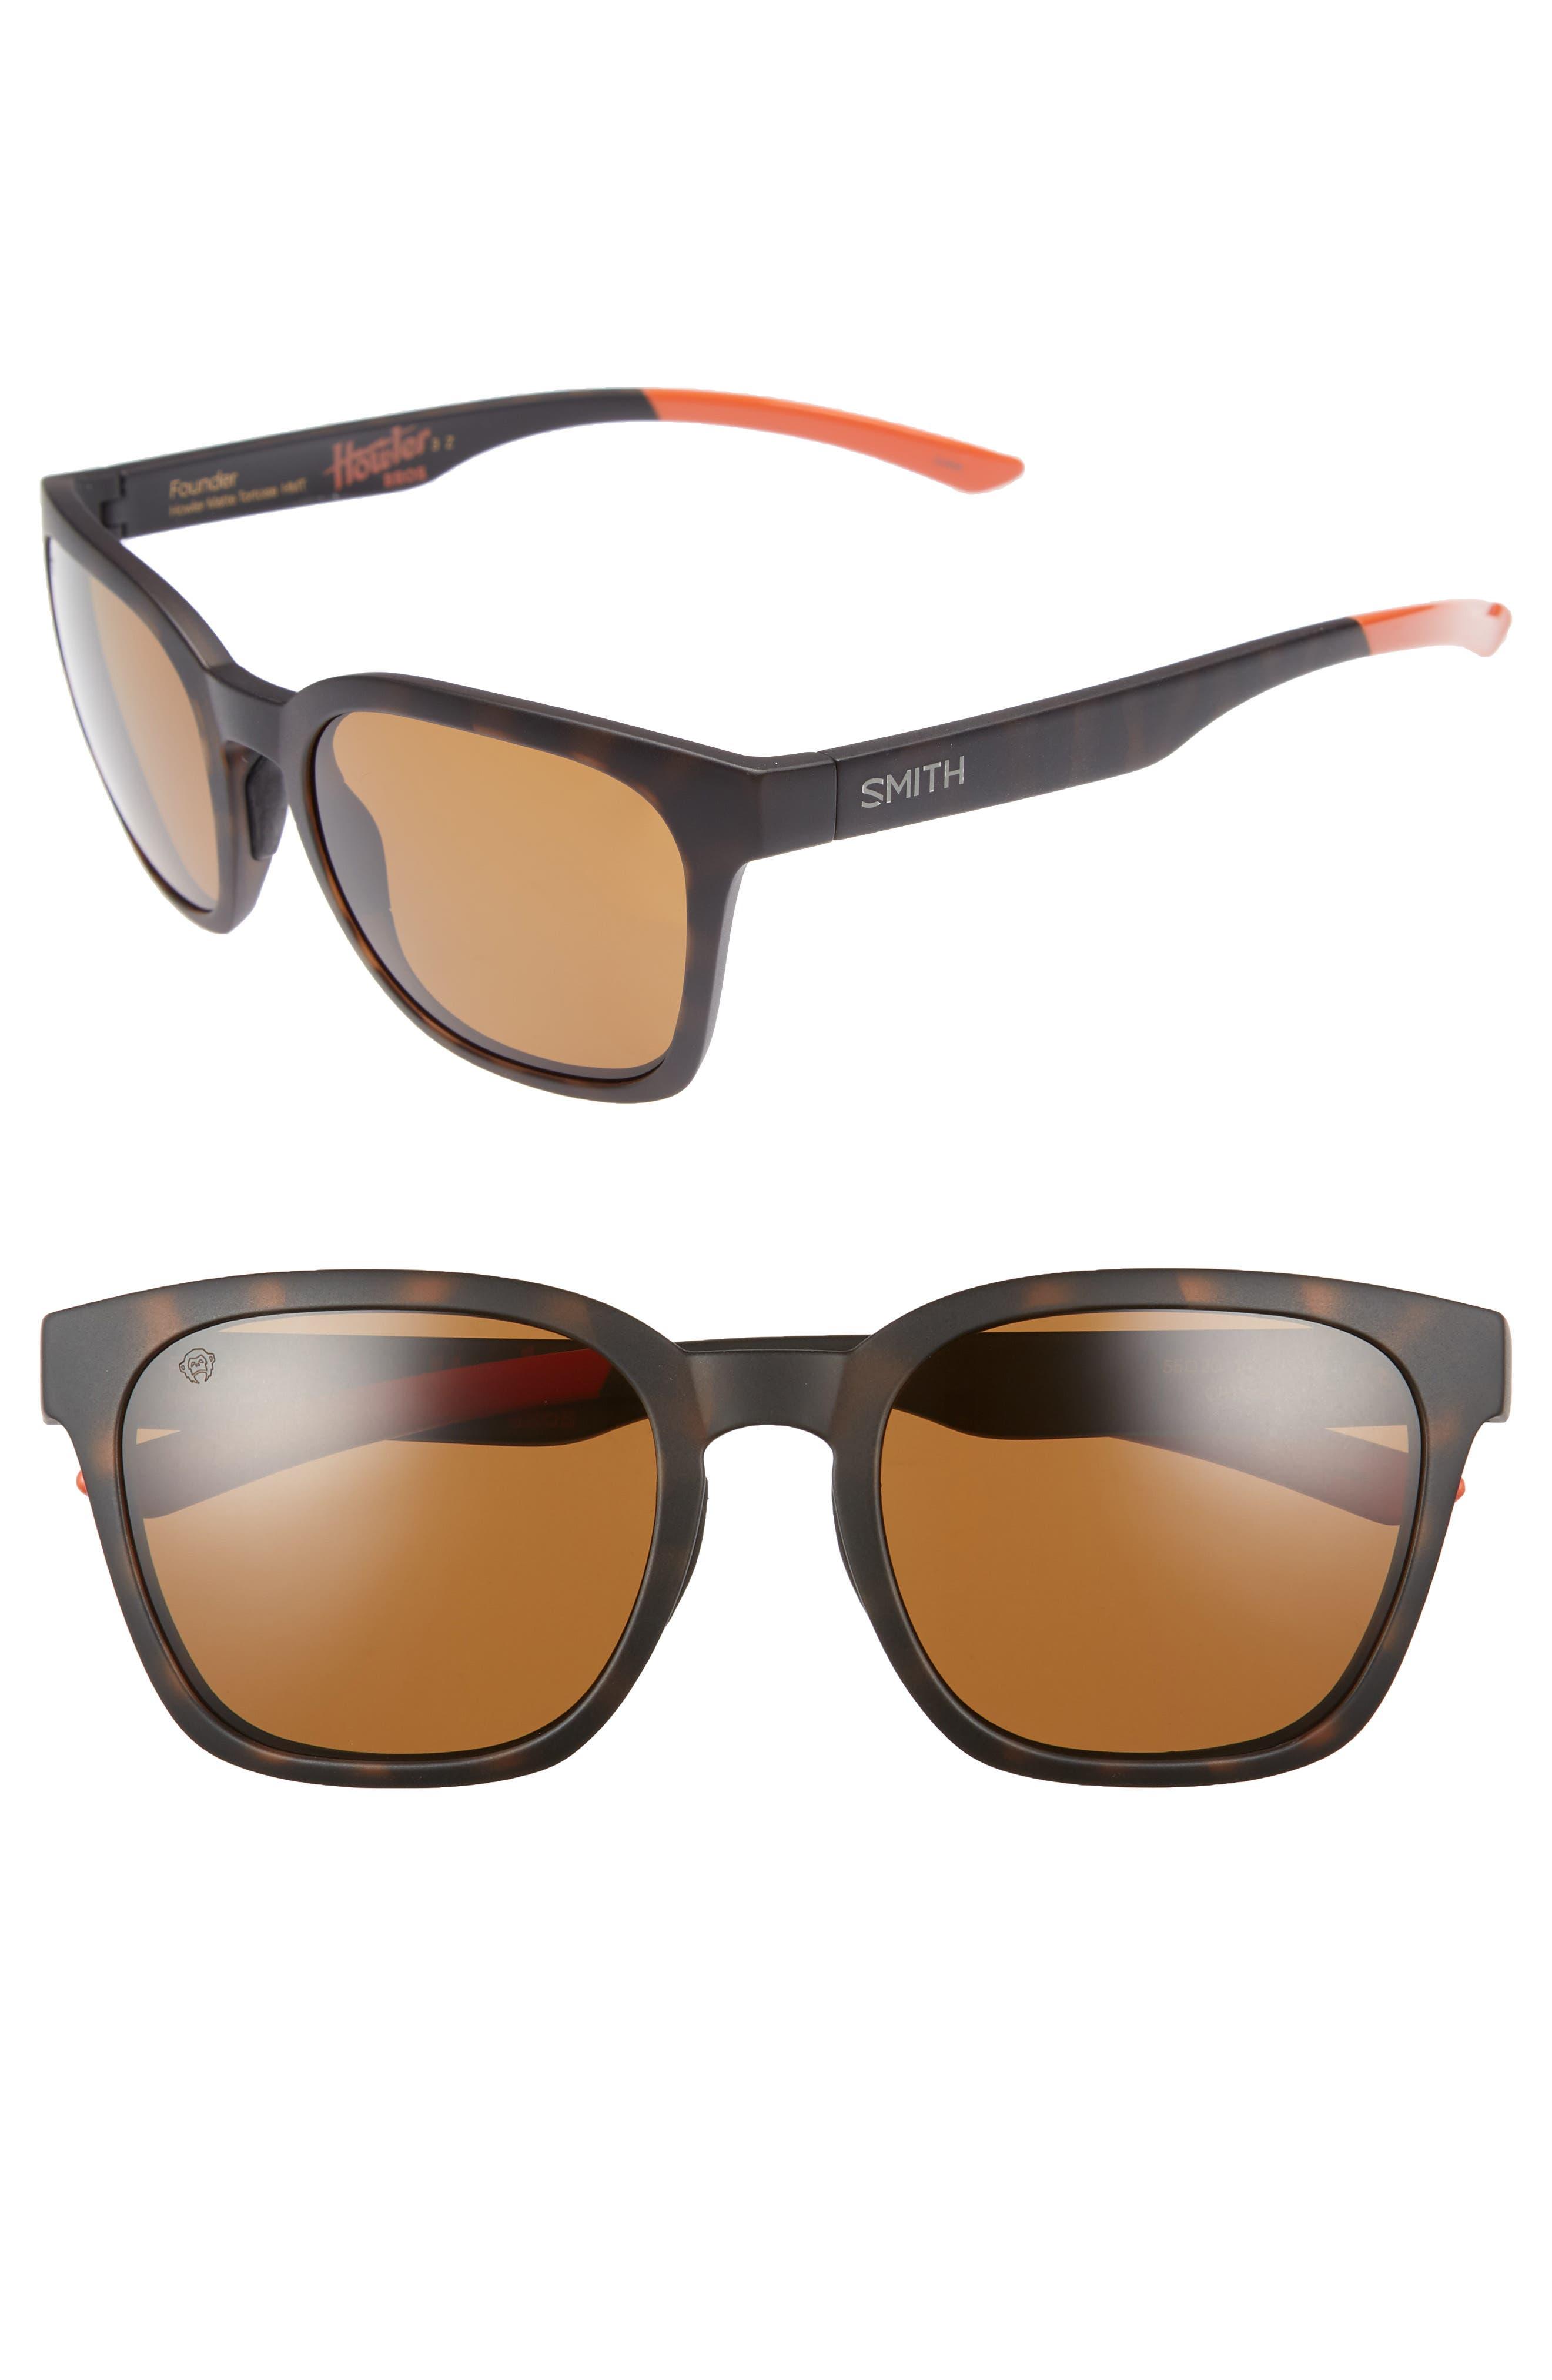 Founder 56mm ChromaPop Polarized Sunglasses,                             Main thumbnail 1, color,                             201